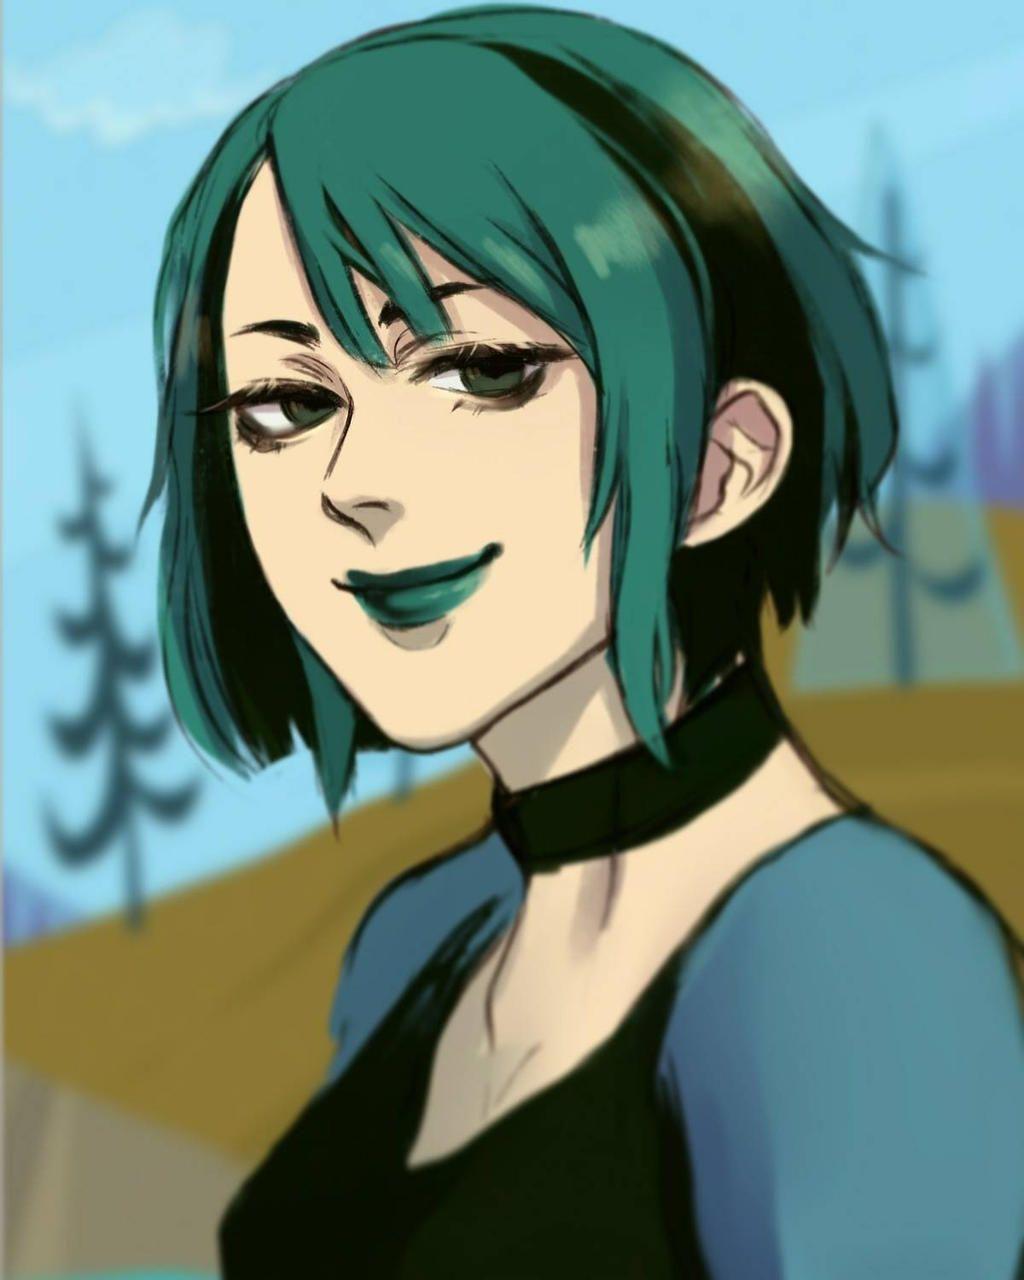 takisahoe - Hobbyist, Digital Artist | DeviantArt